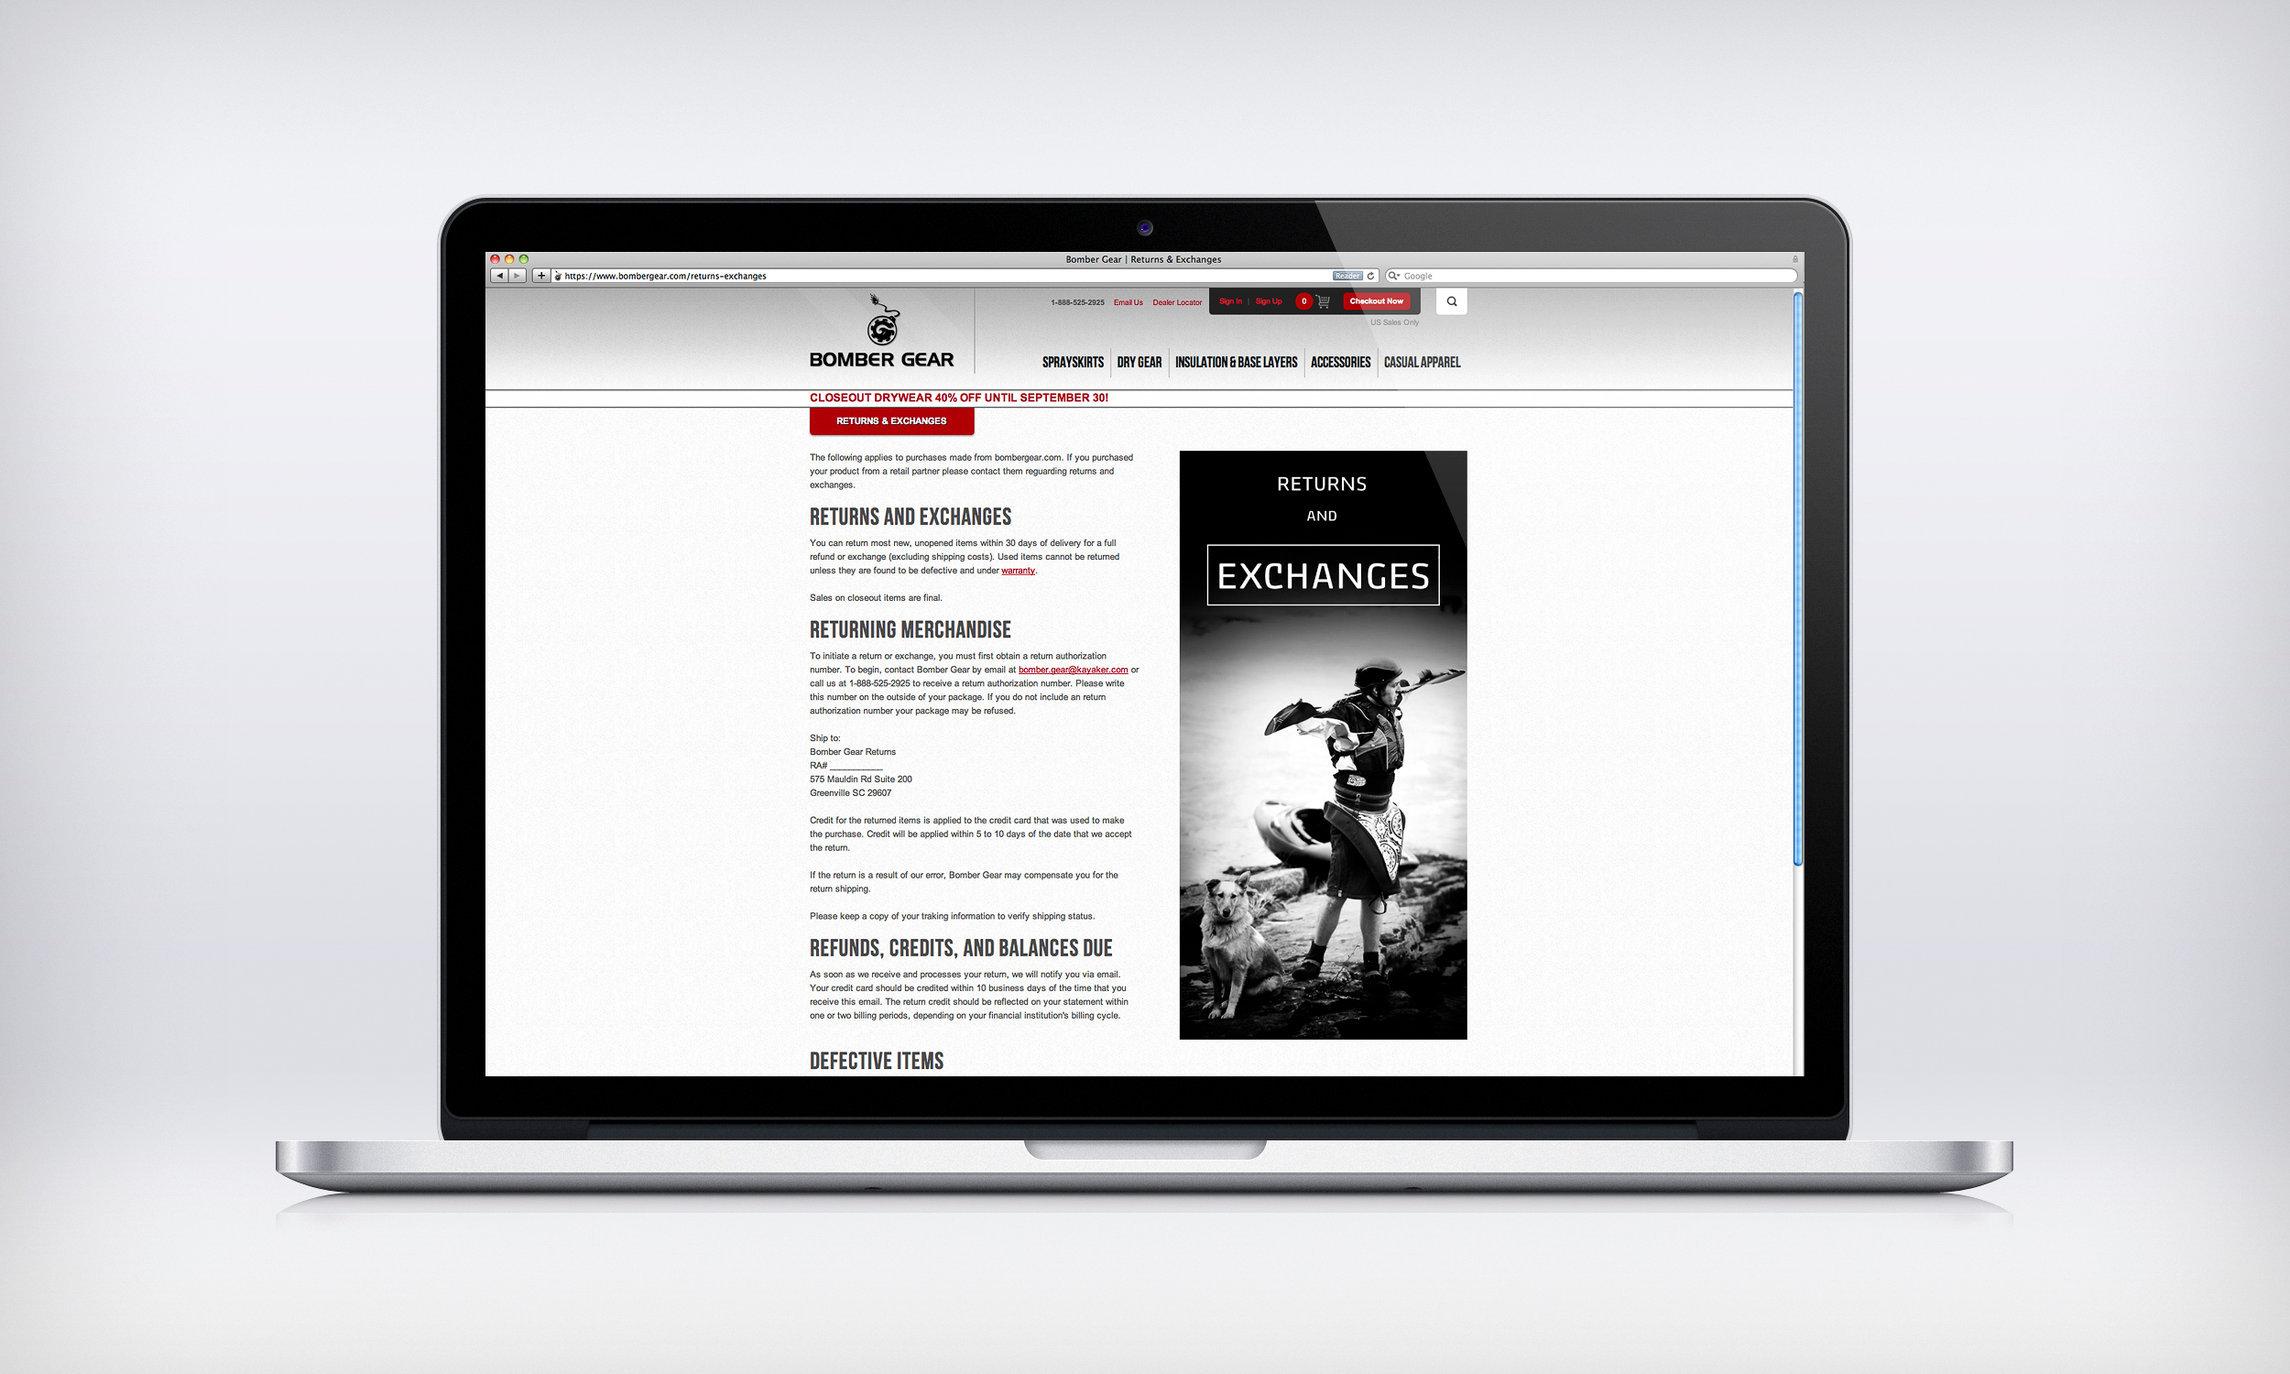 Imagery provided for Bomber Gear's website